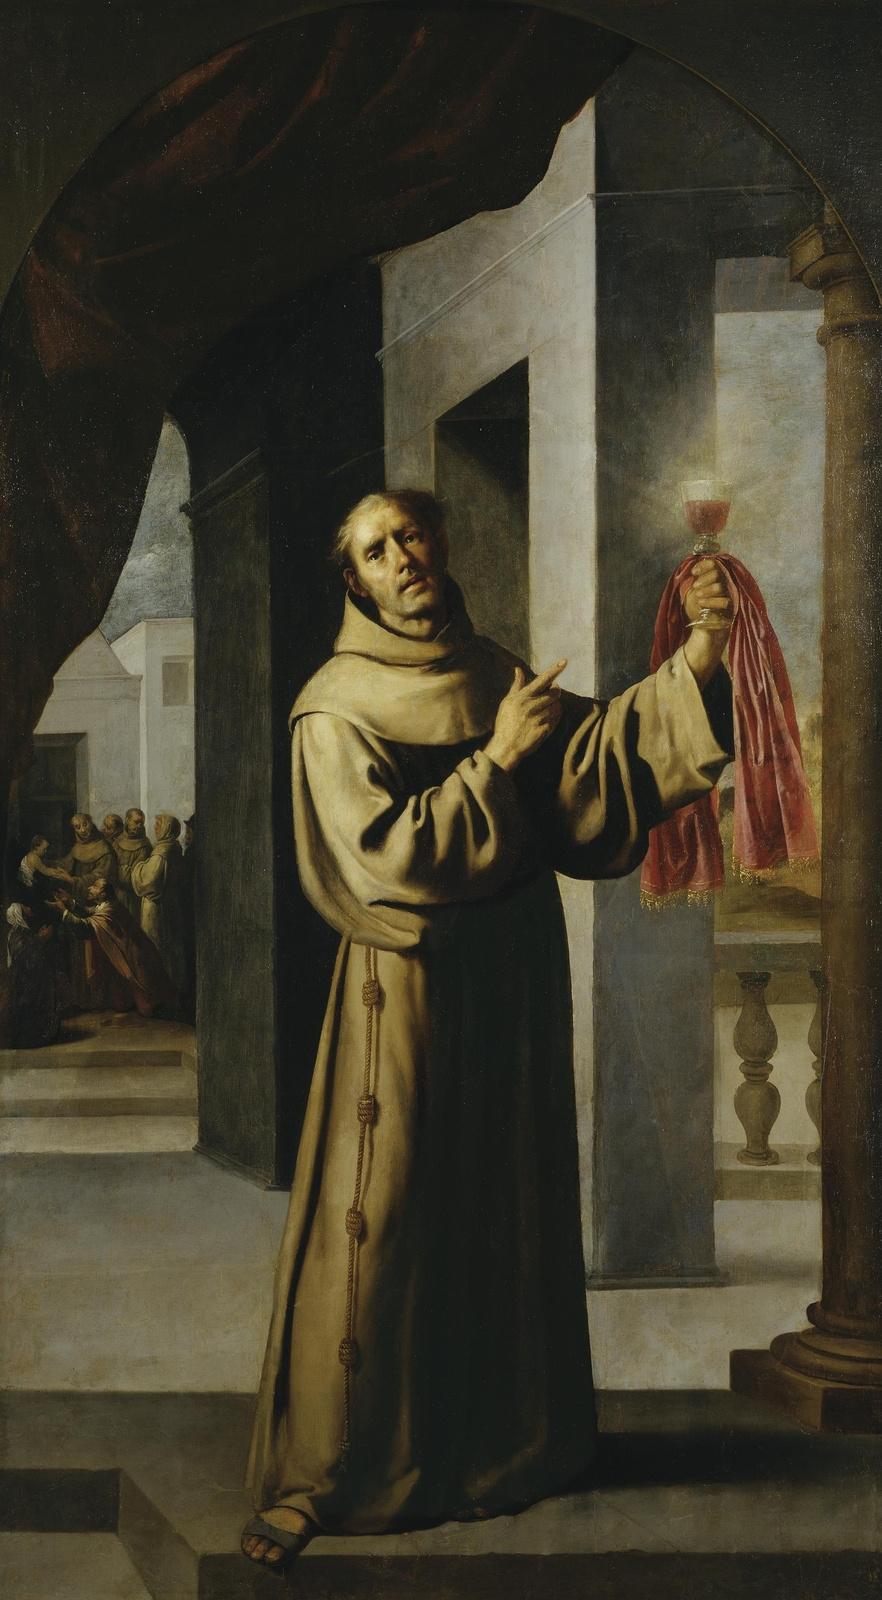 Francisco de Zurbaran. Saint James of the marches